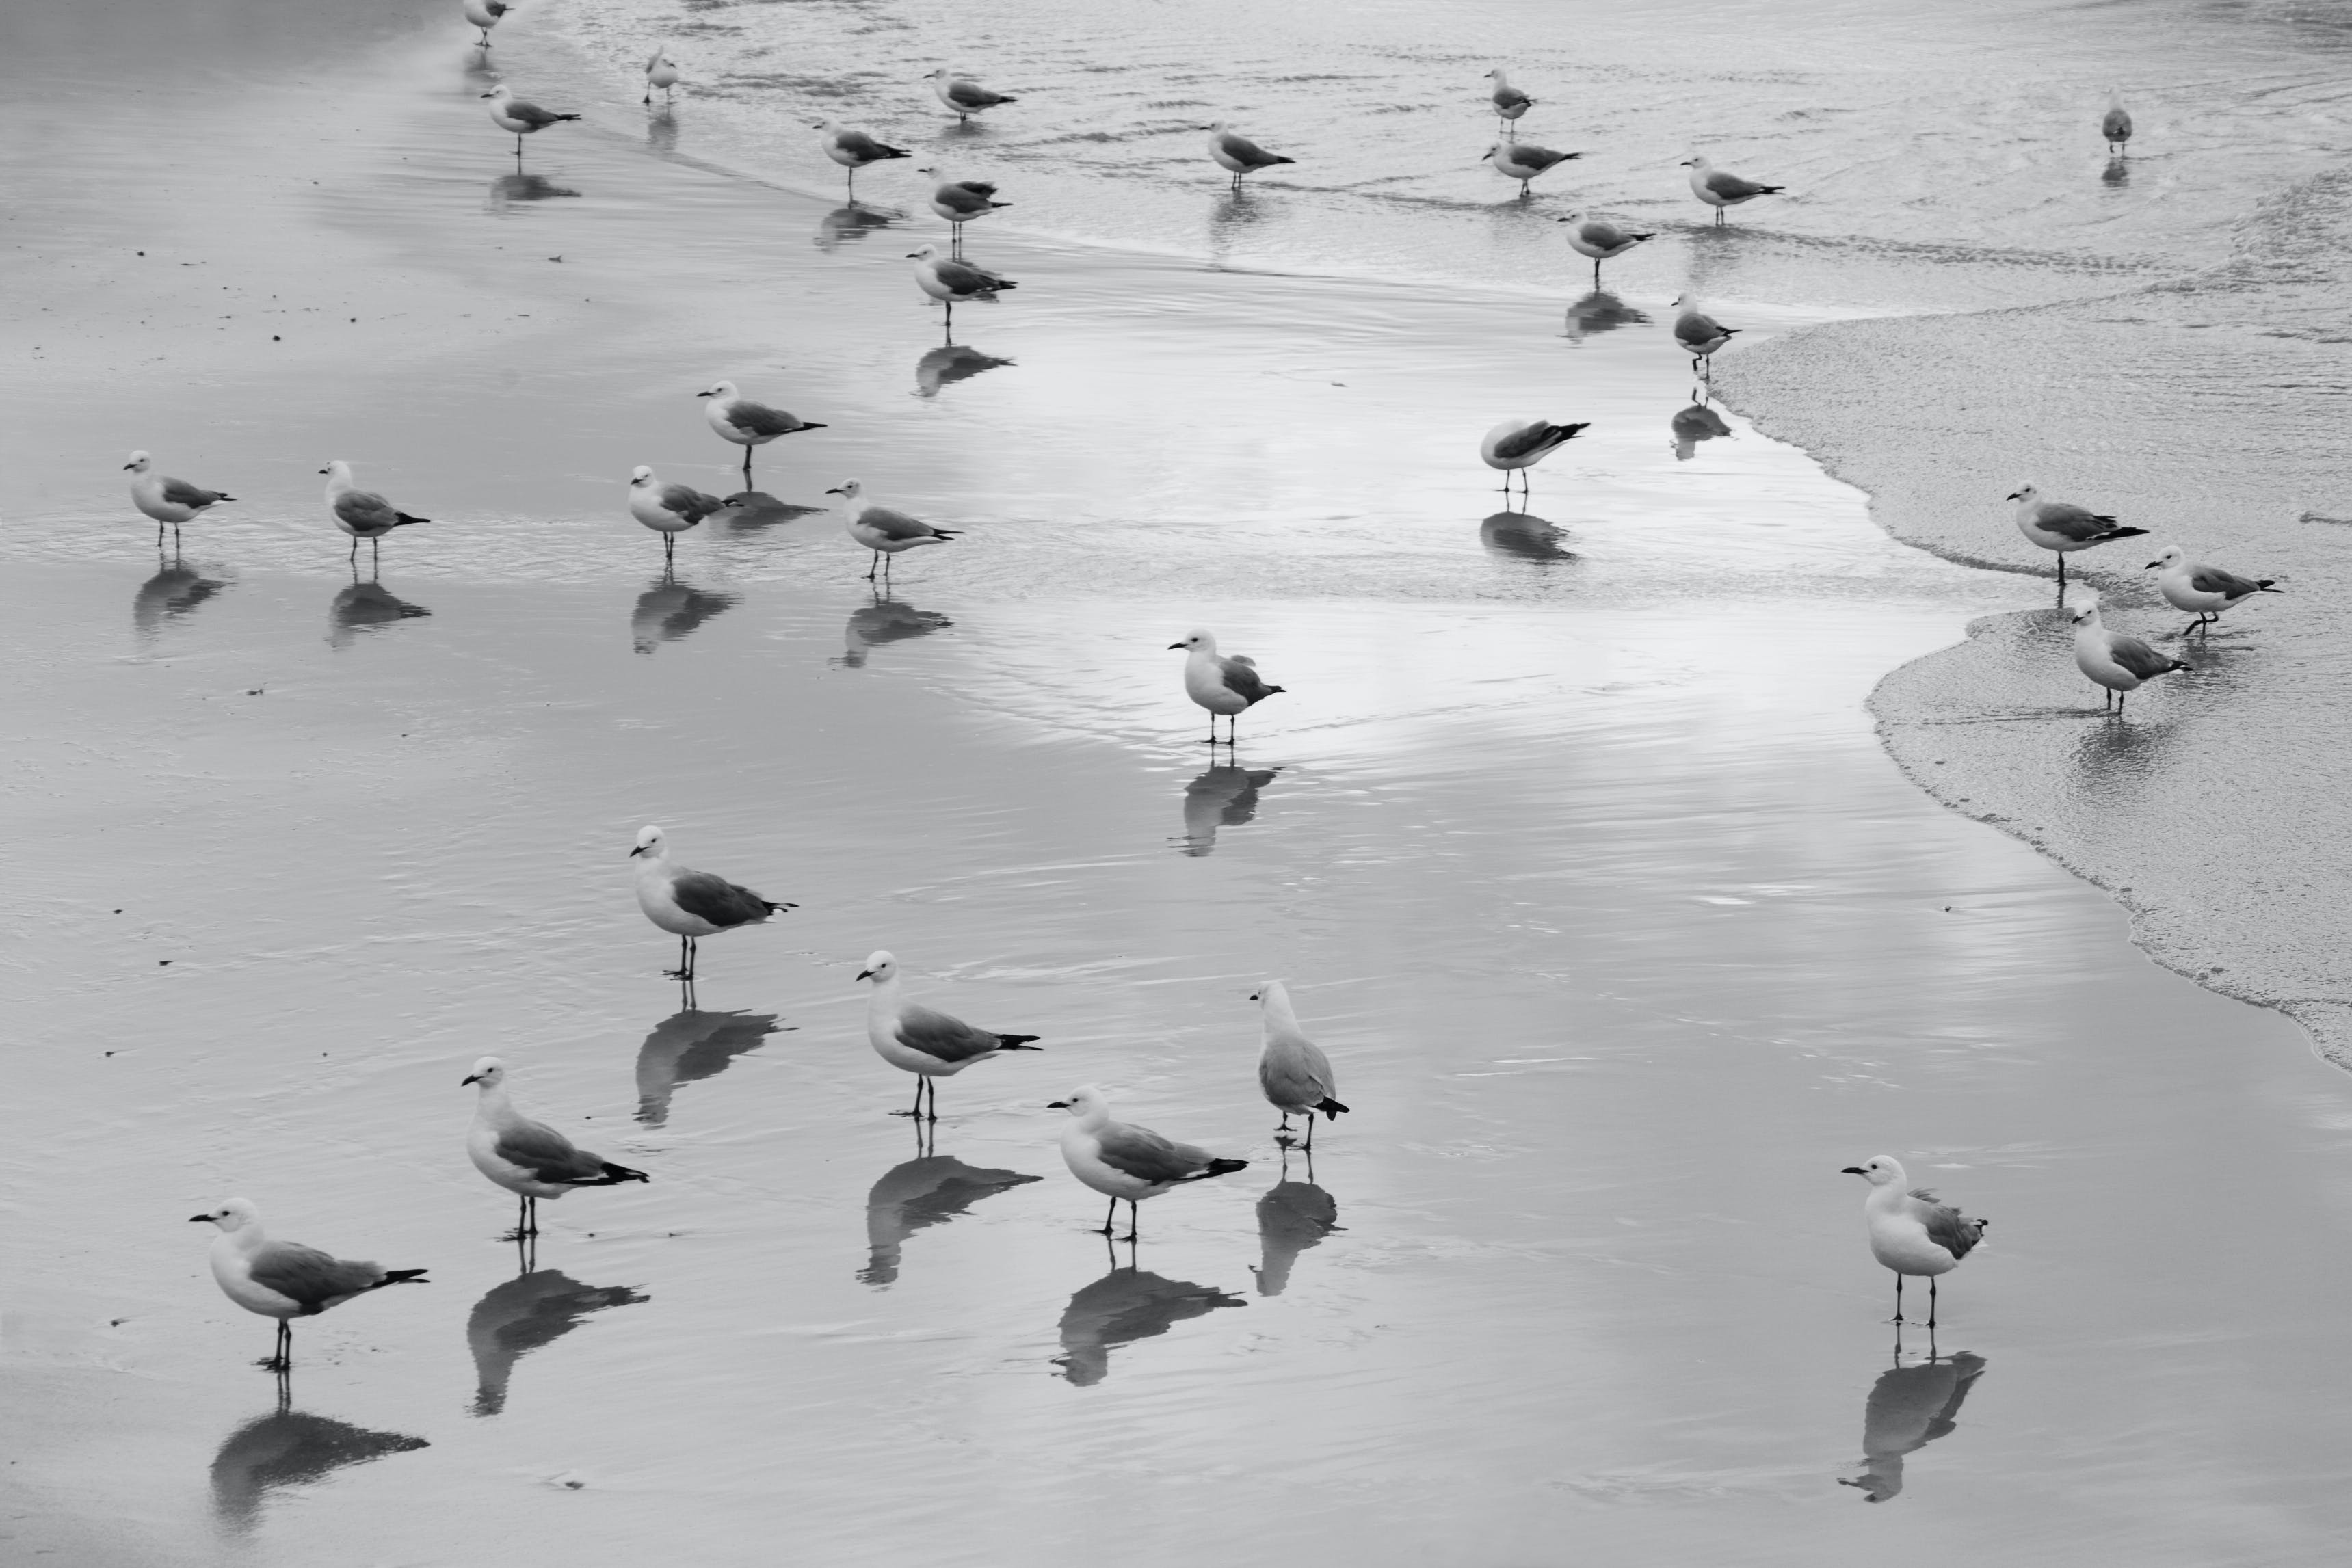 Grayscale Flock of Birds on Beach